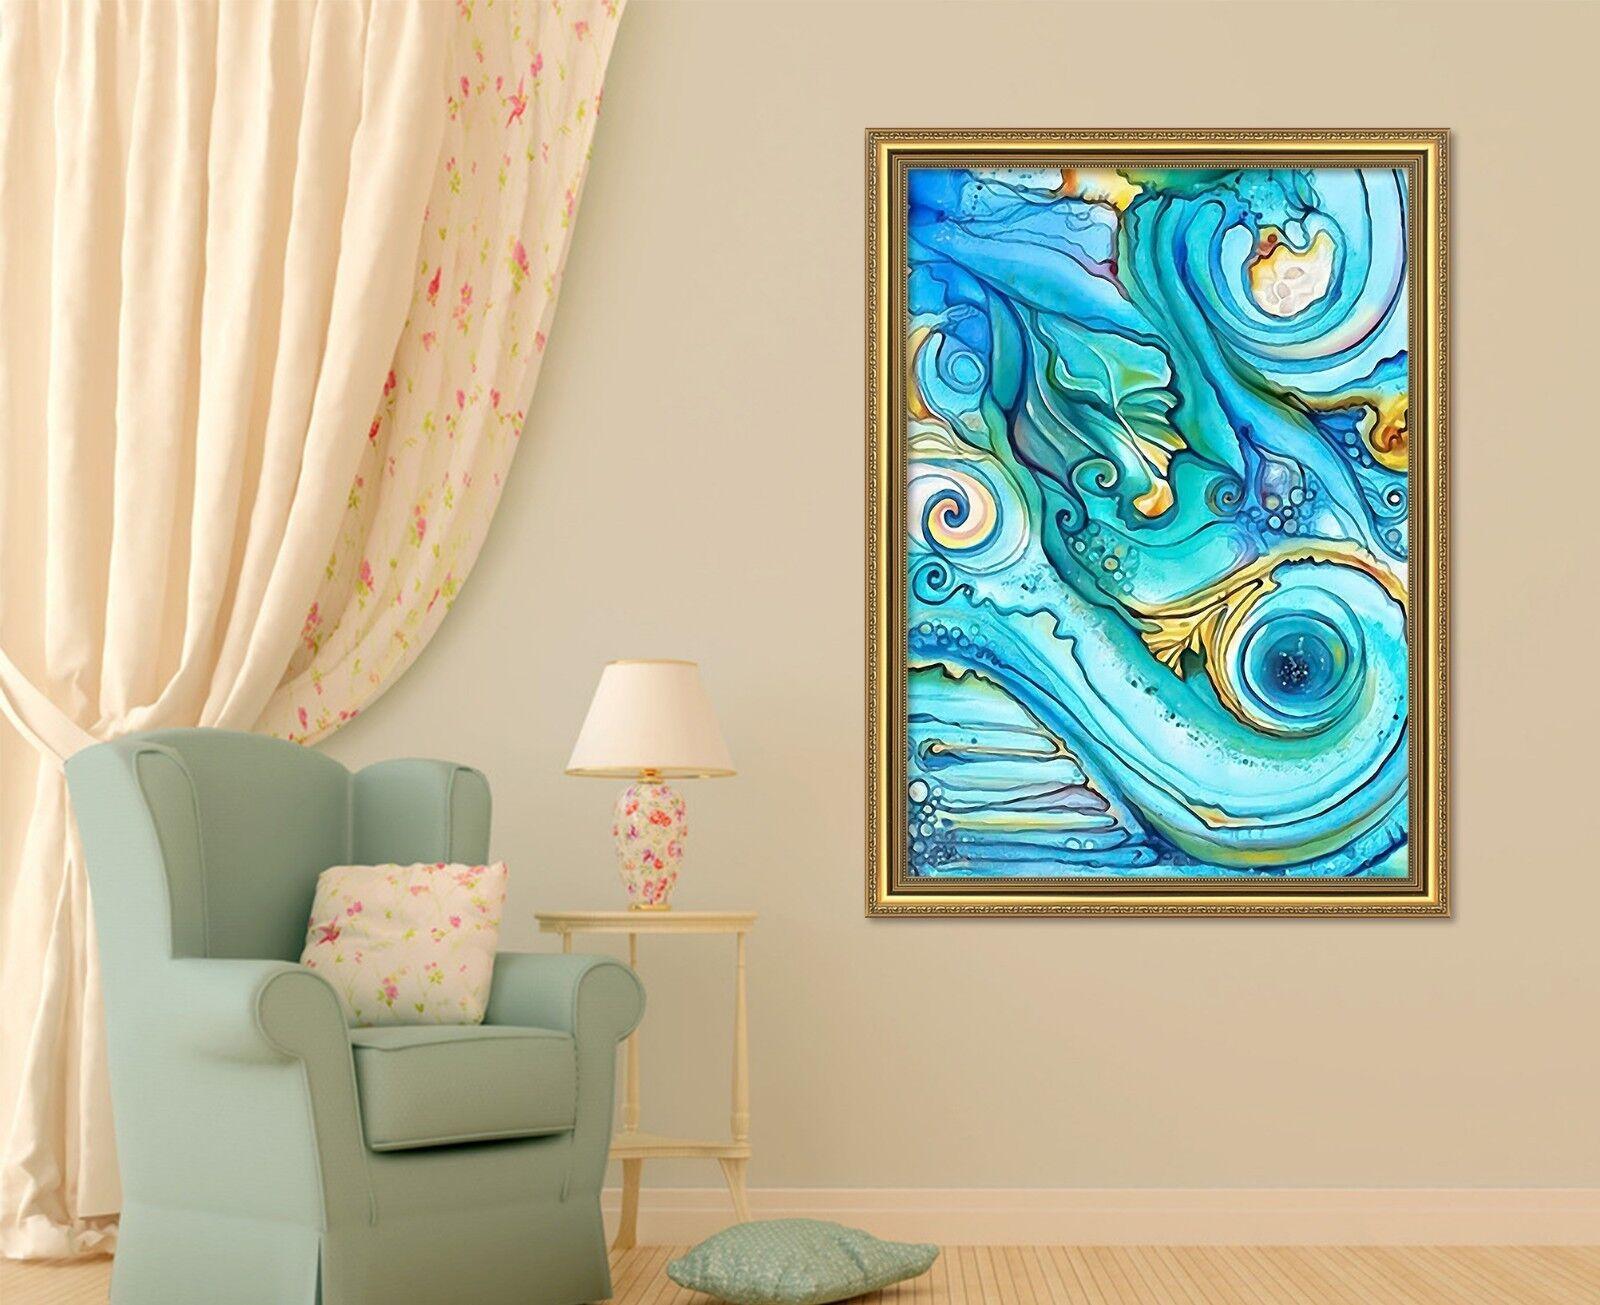 3D Natural Texture 6 Framed Poster Home Decor Print Painting Art AJ AU